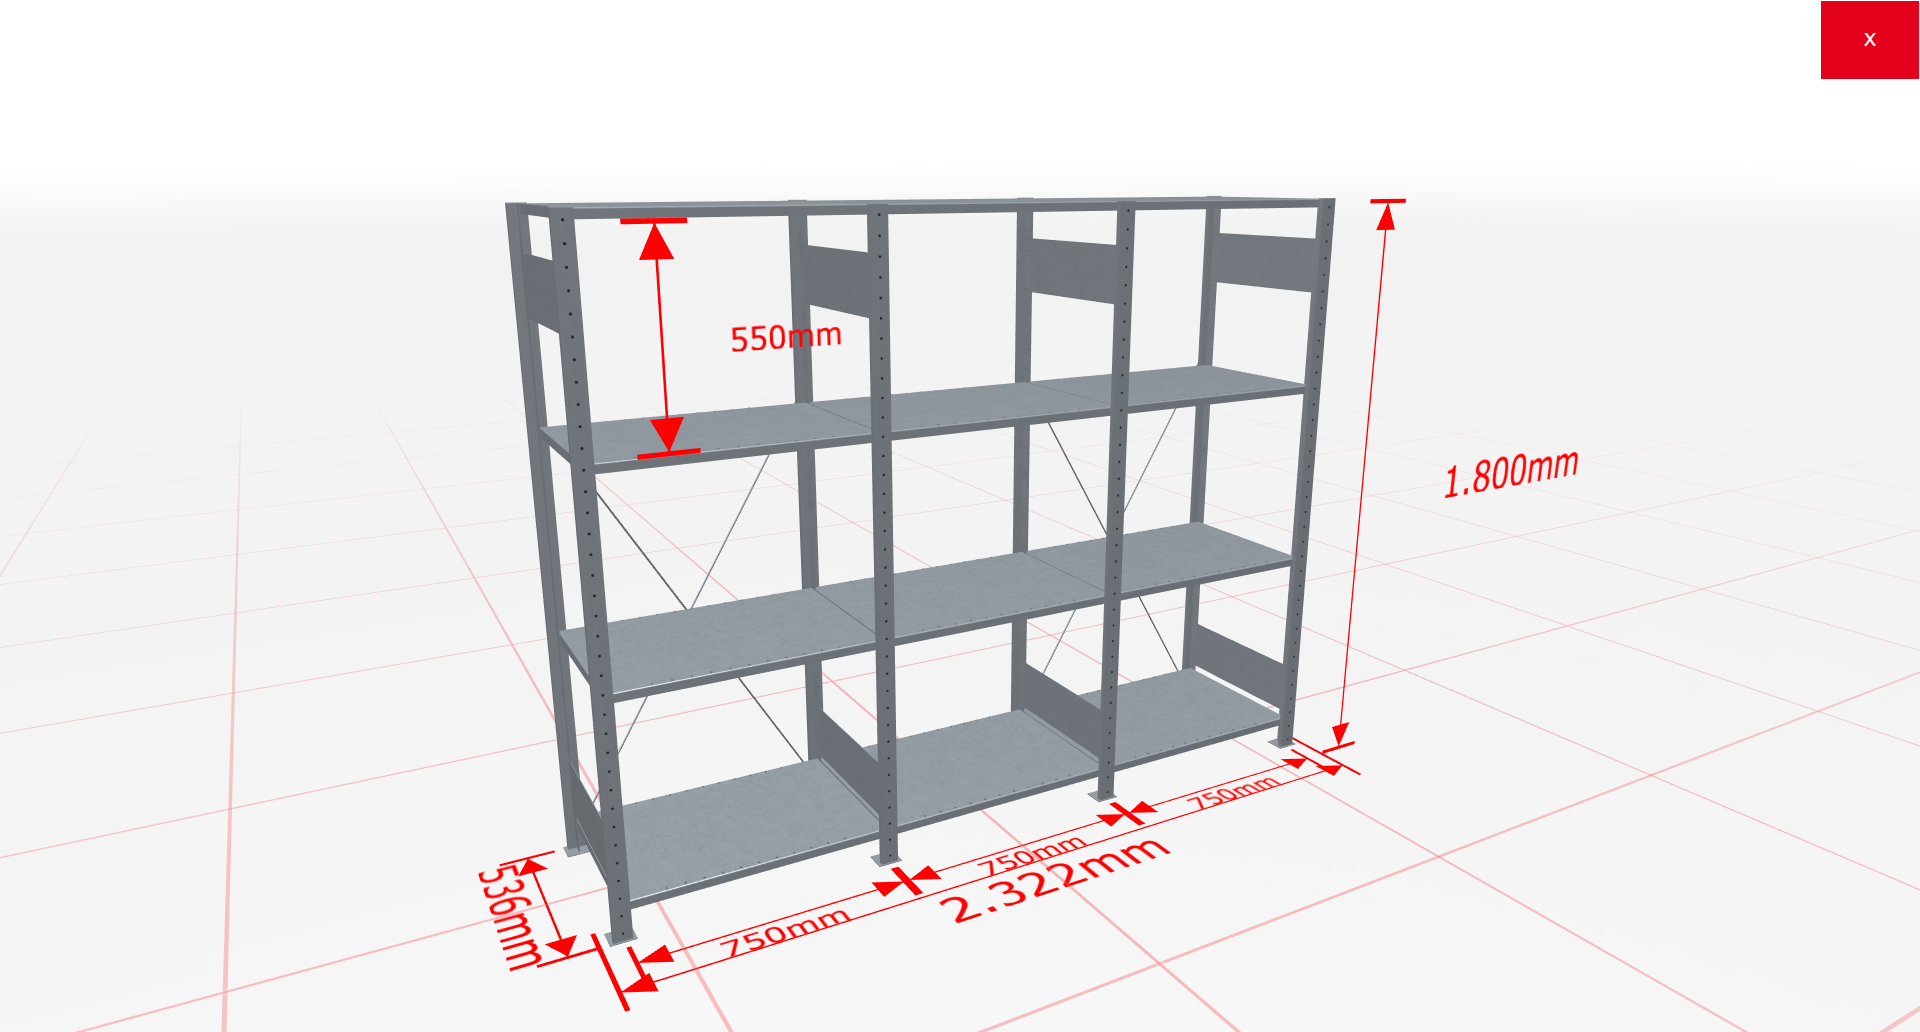 Fachbodenregal Komplettregal 1800x2322x500 mm (HxBxT) SCHULTE Lagertechnik verzinkt 4 Ebenen  150 kg je Boden